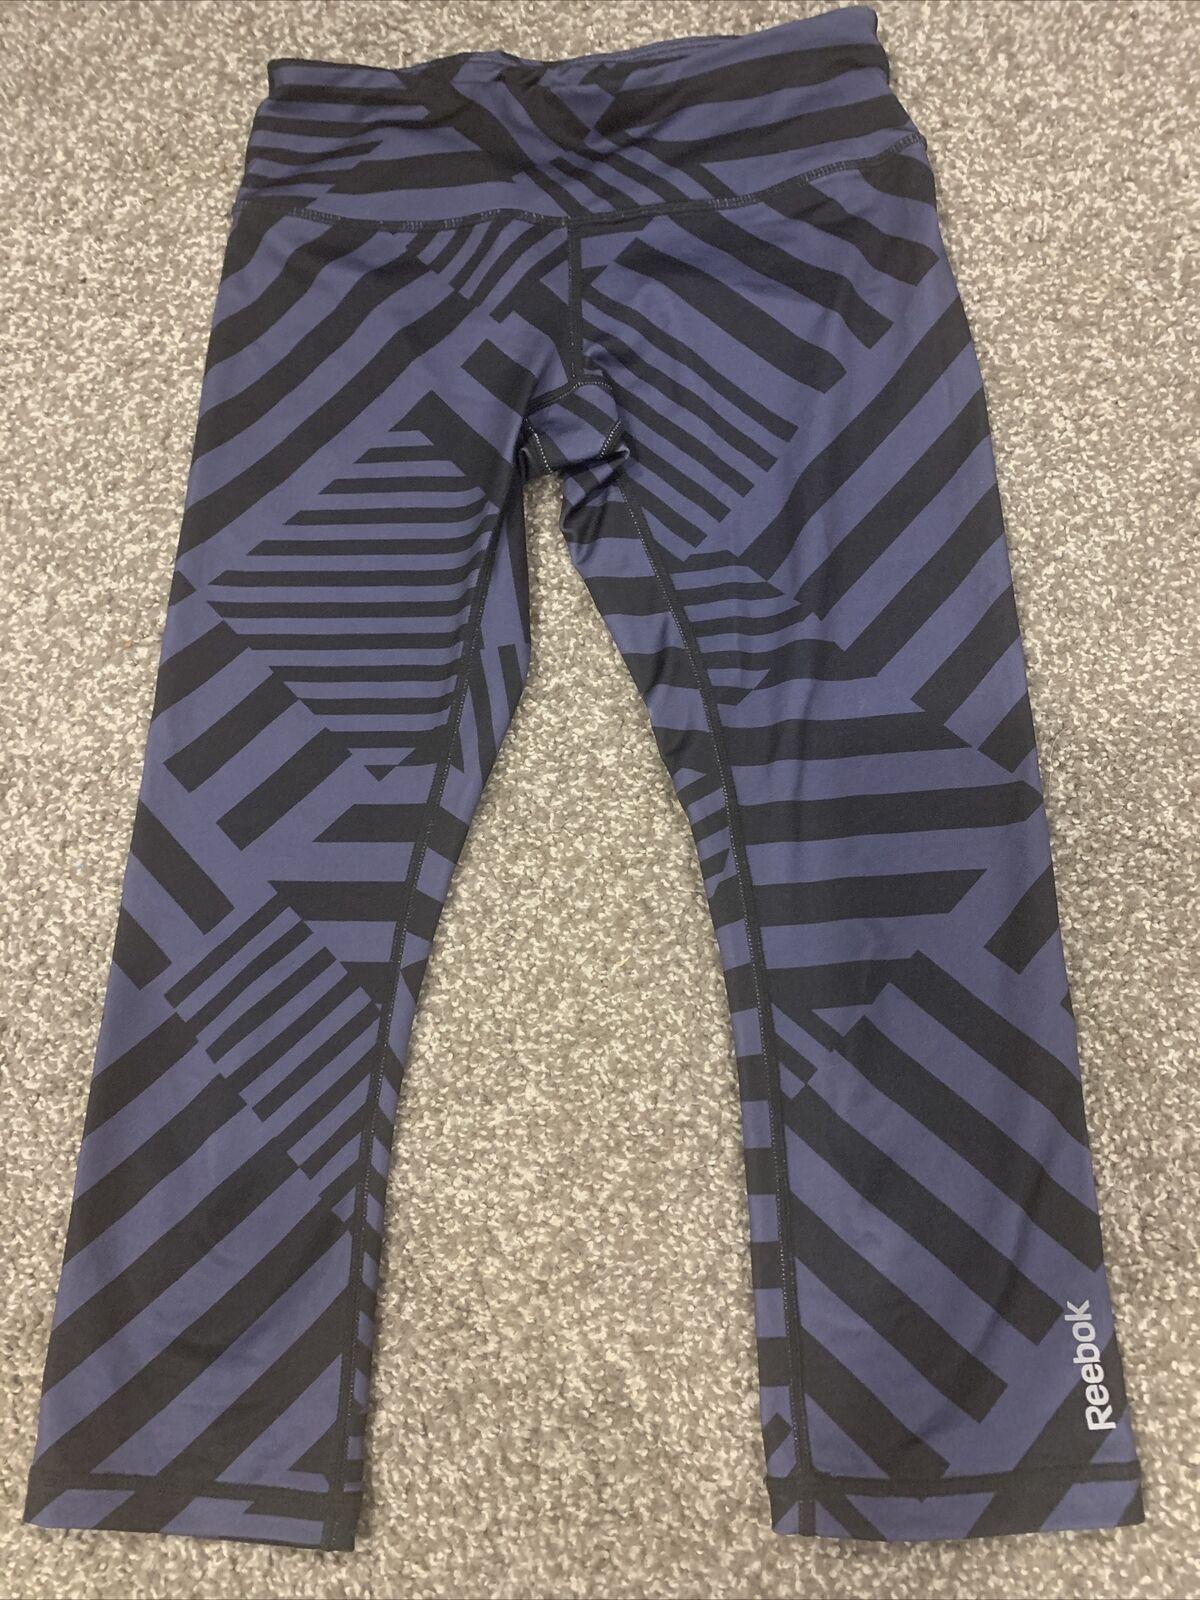 Reebok Leggings Size XS Workout Athletic Black And Gray/Blue Geometric Capri